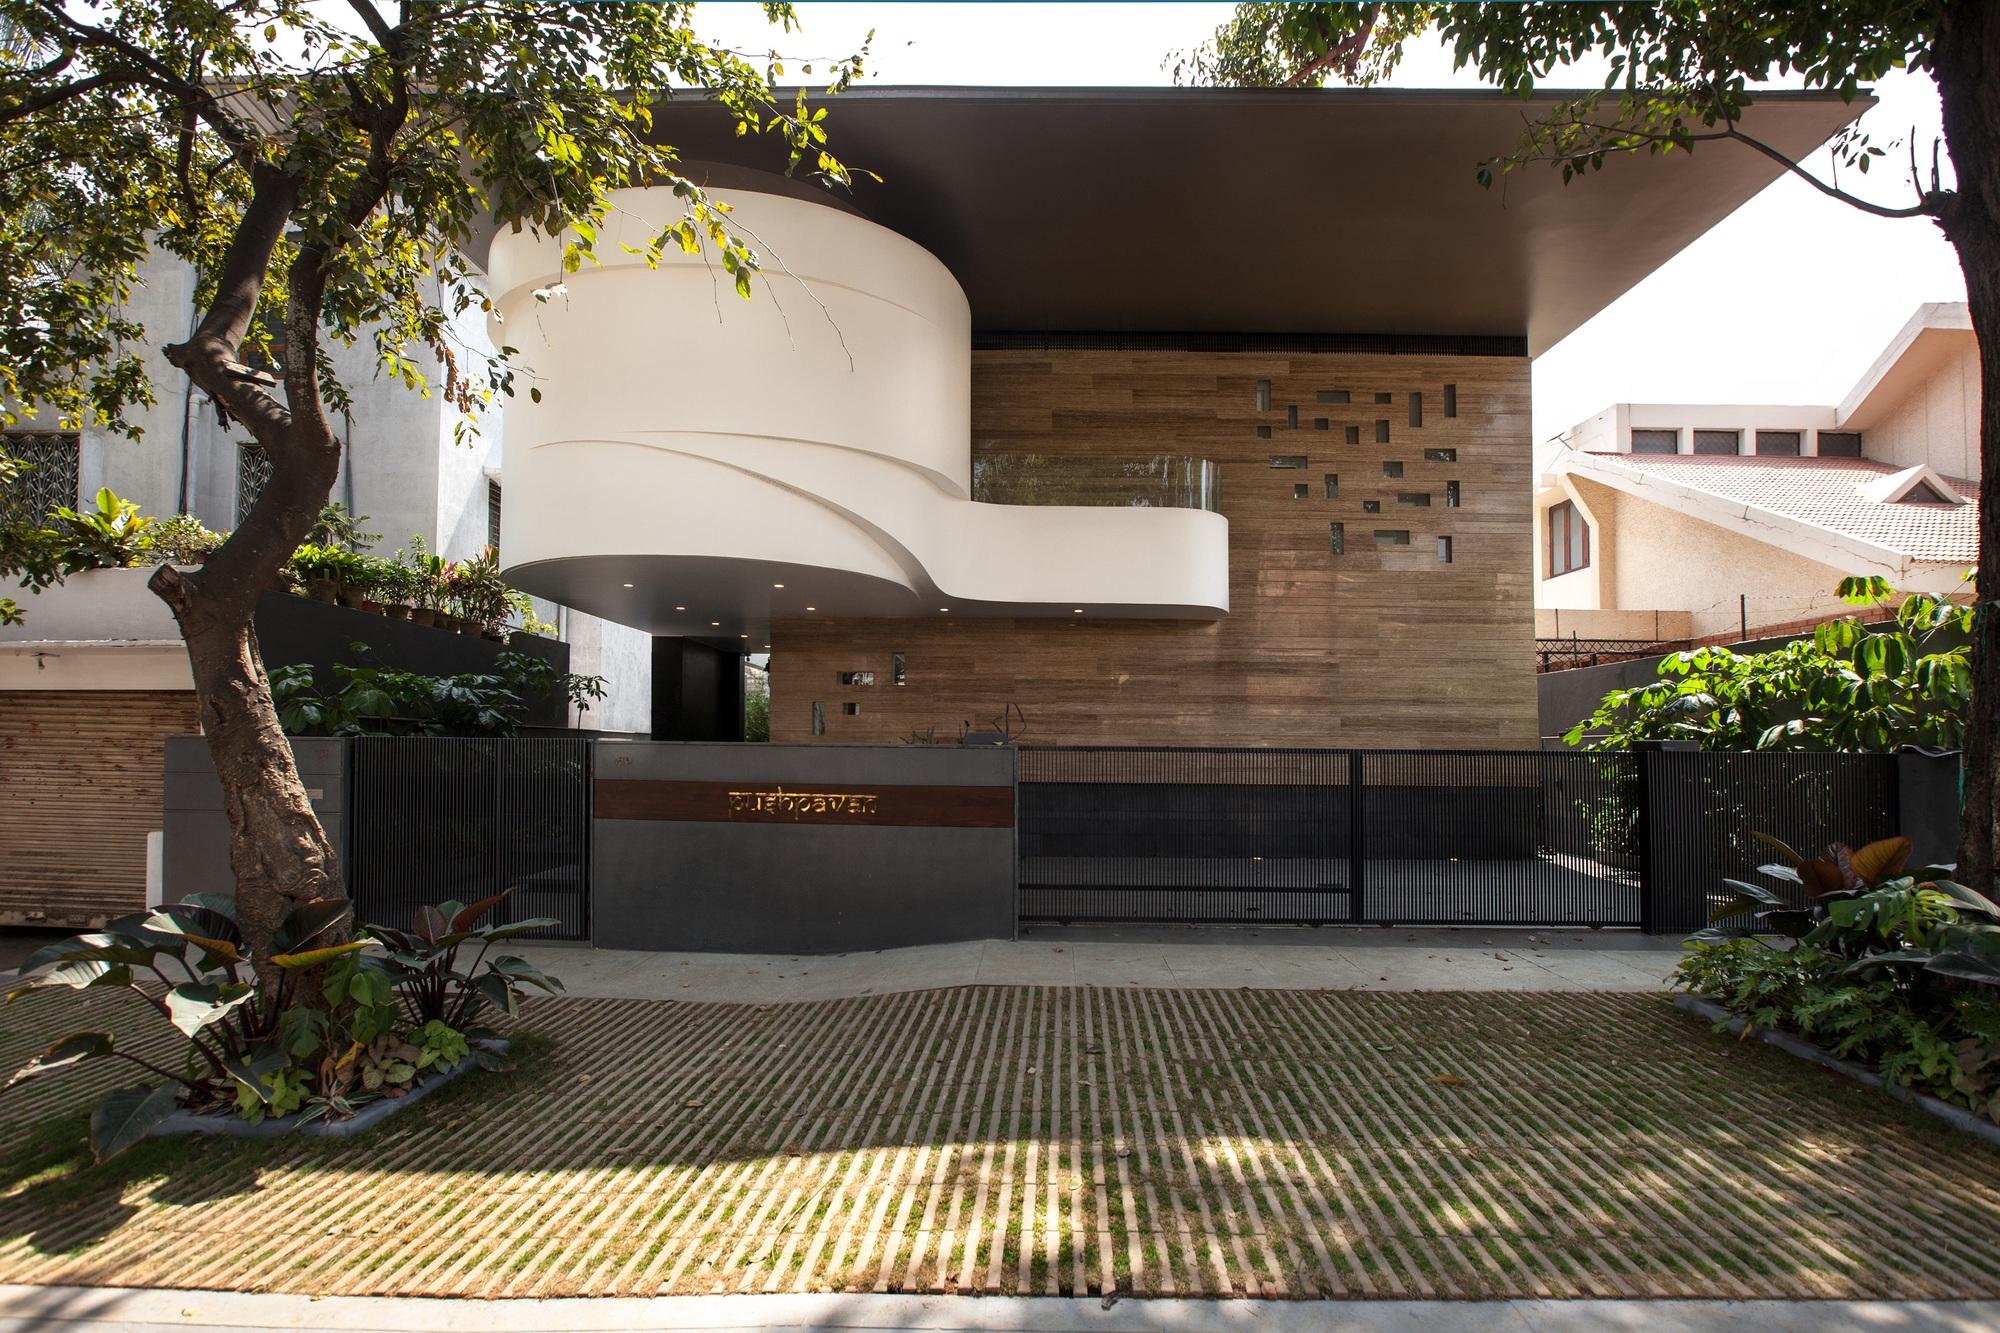 B-one / Cadence Architects